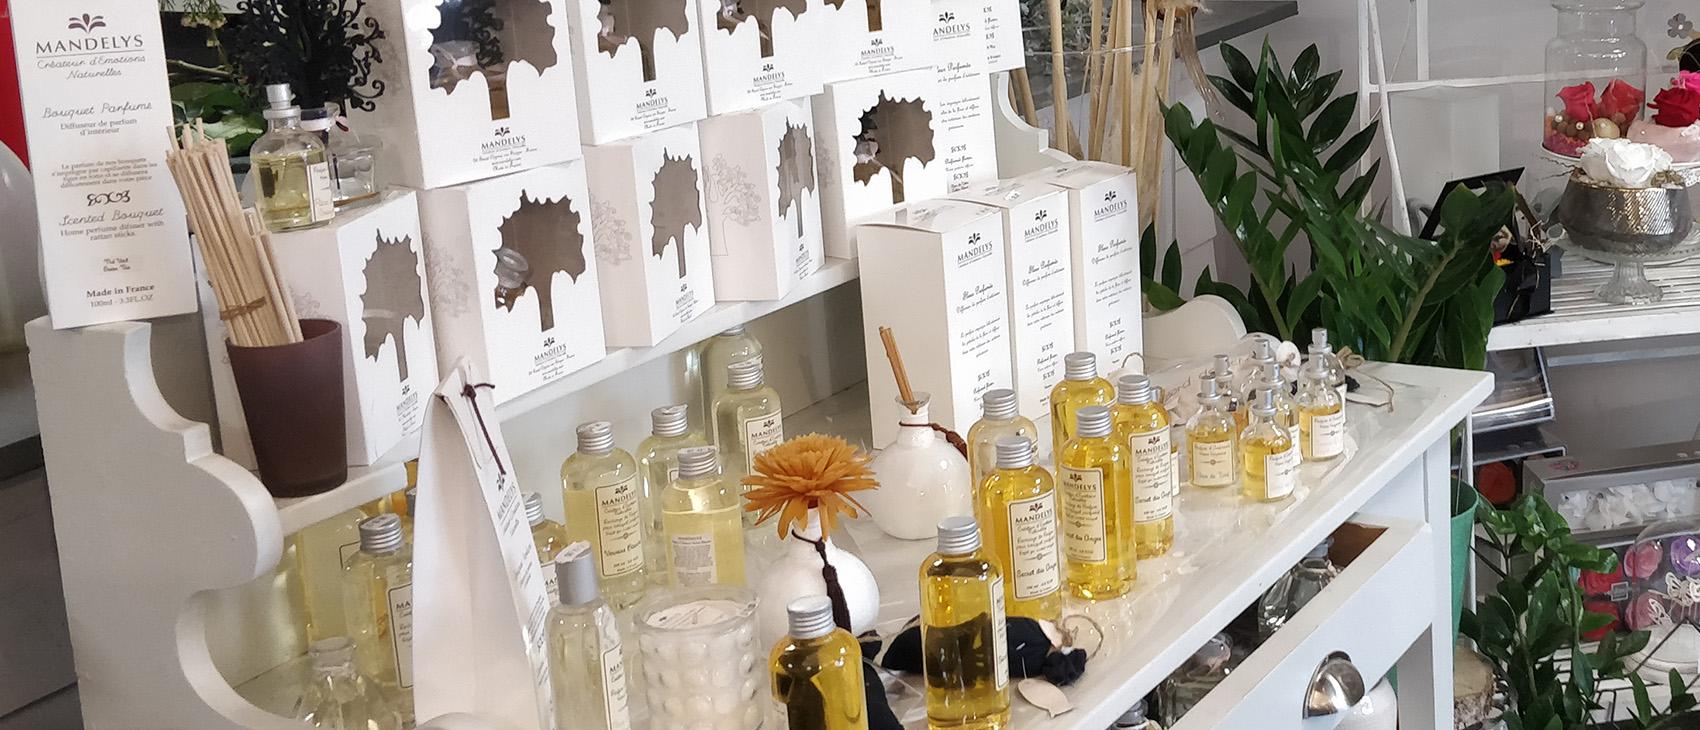 Parfums d'ambiance Mandalys